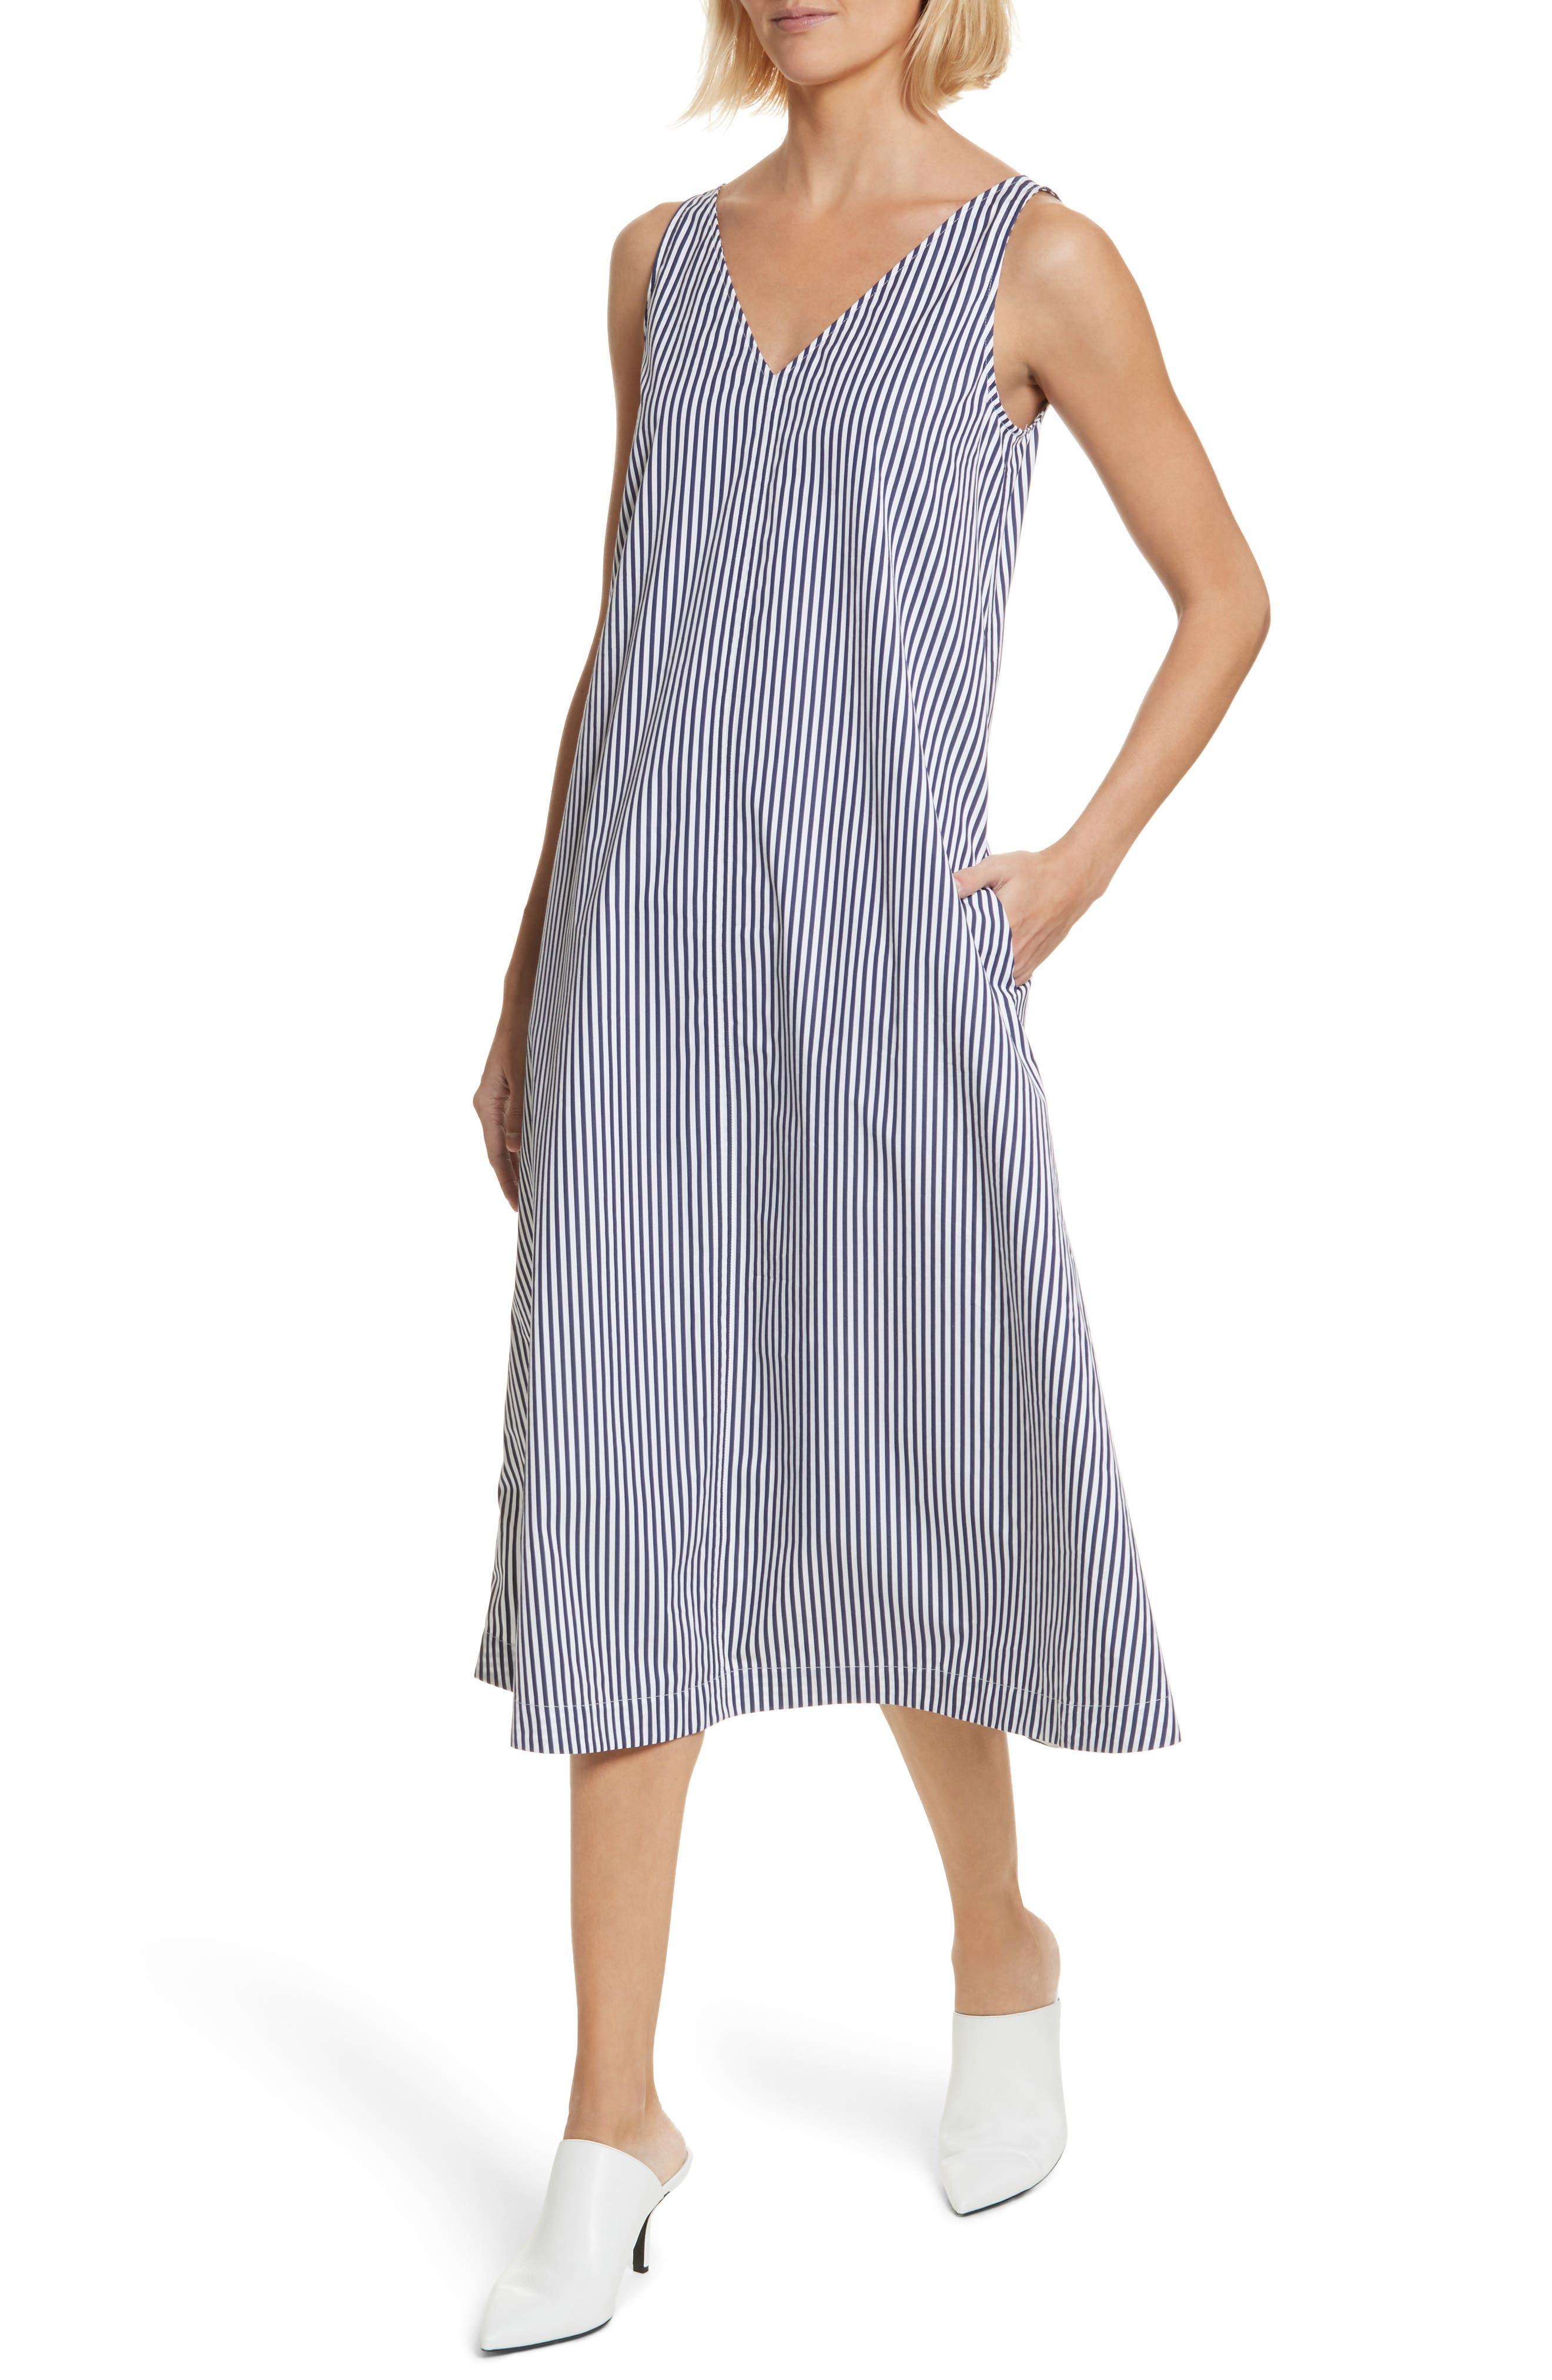 Davey Candy Stripe Shift Dress,                             Alternate thumbnail 4, color,                             456